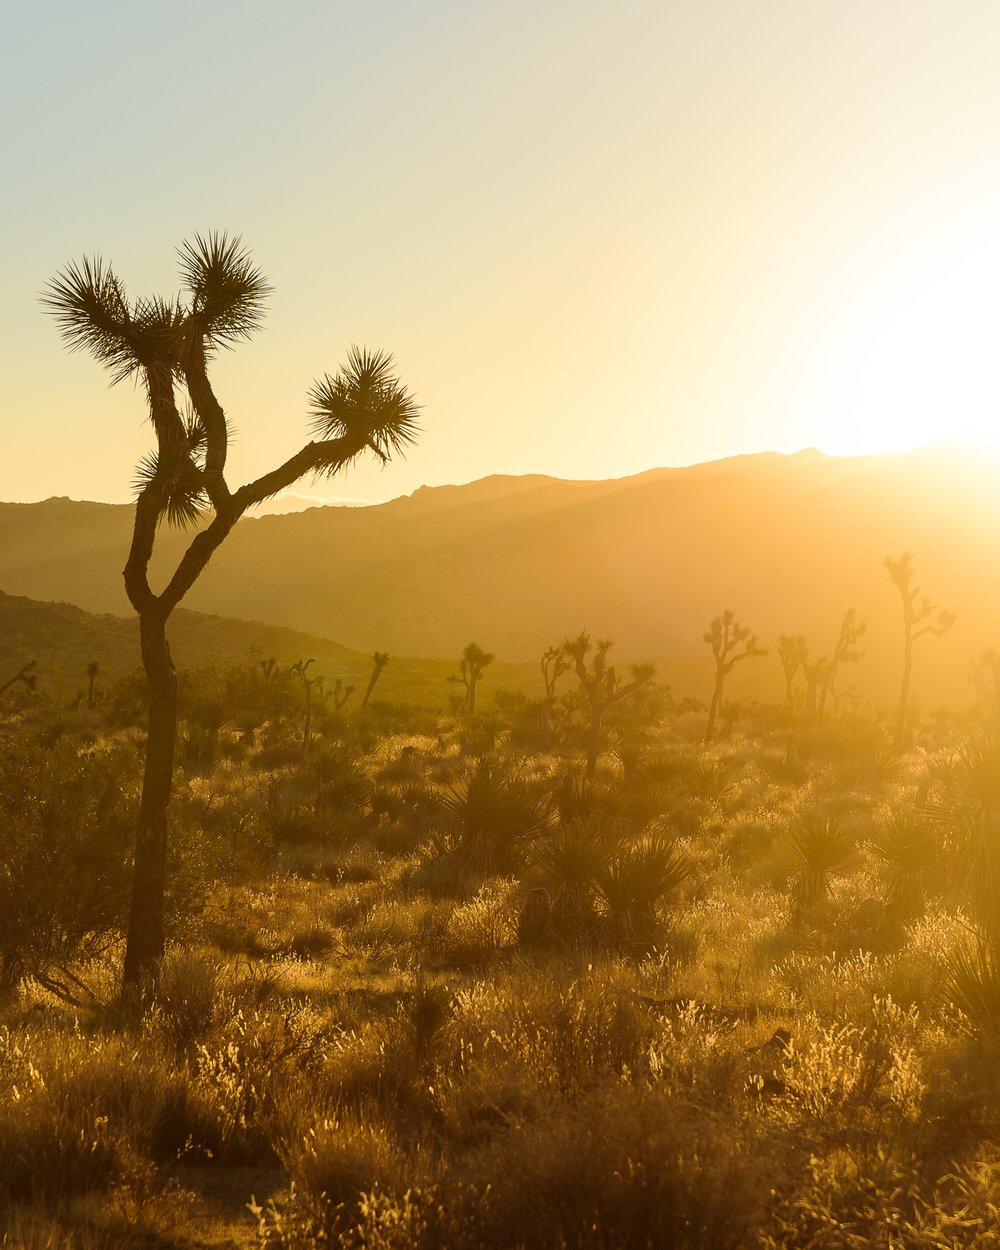 down_dusty_trails_joshua_tree_sunset_glow.jpg